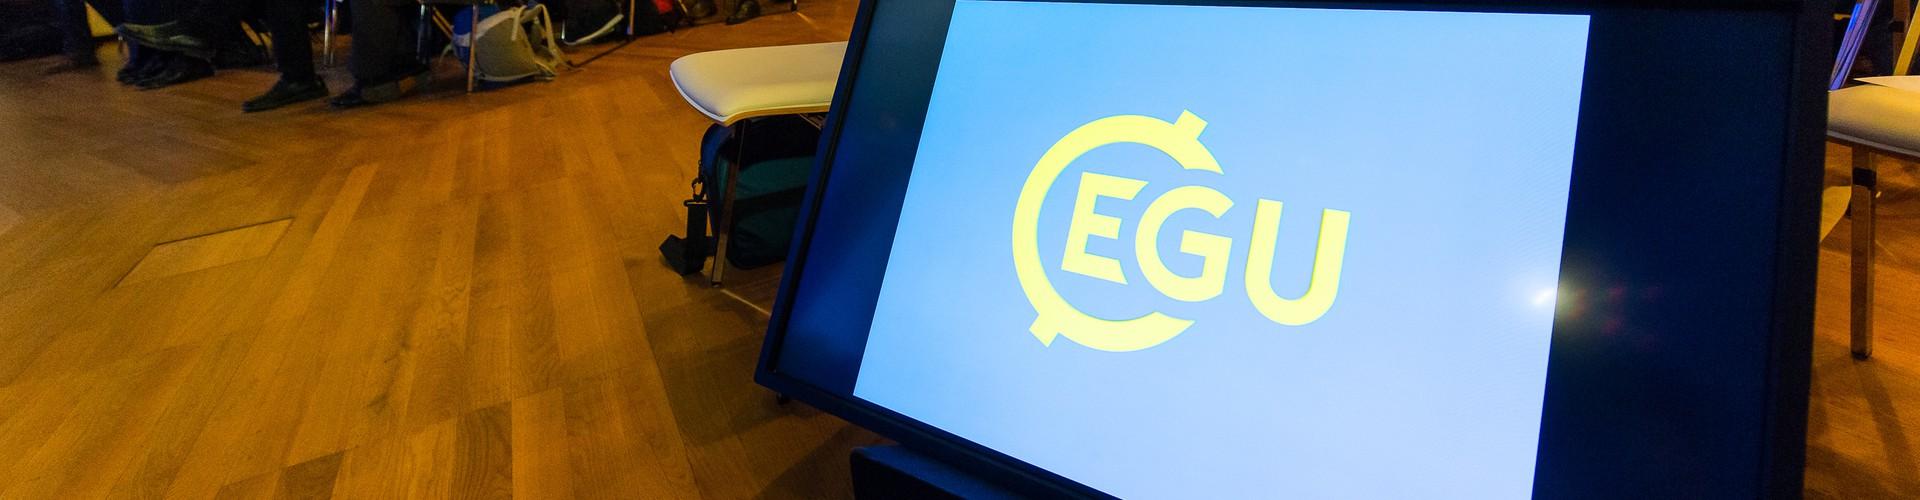 EGU Award Ceremony at the EGU 2016 General Assembly (Credit: EGU/Foto Pfluegl)